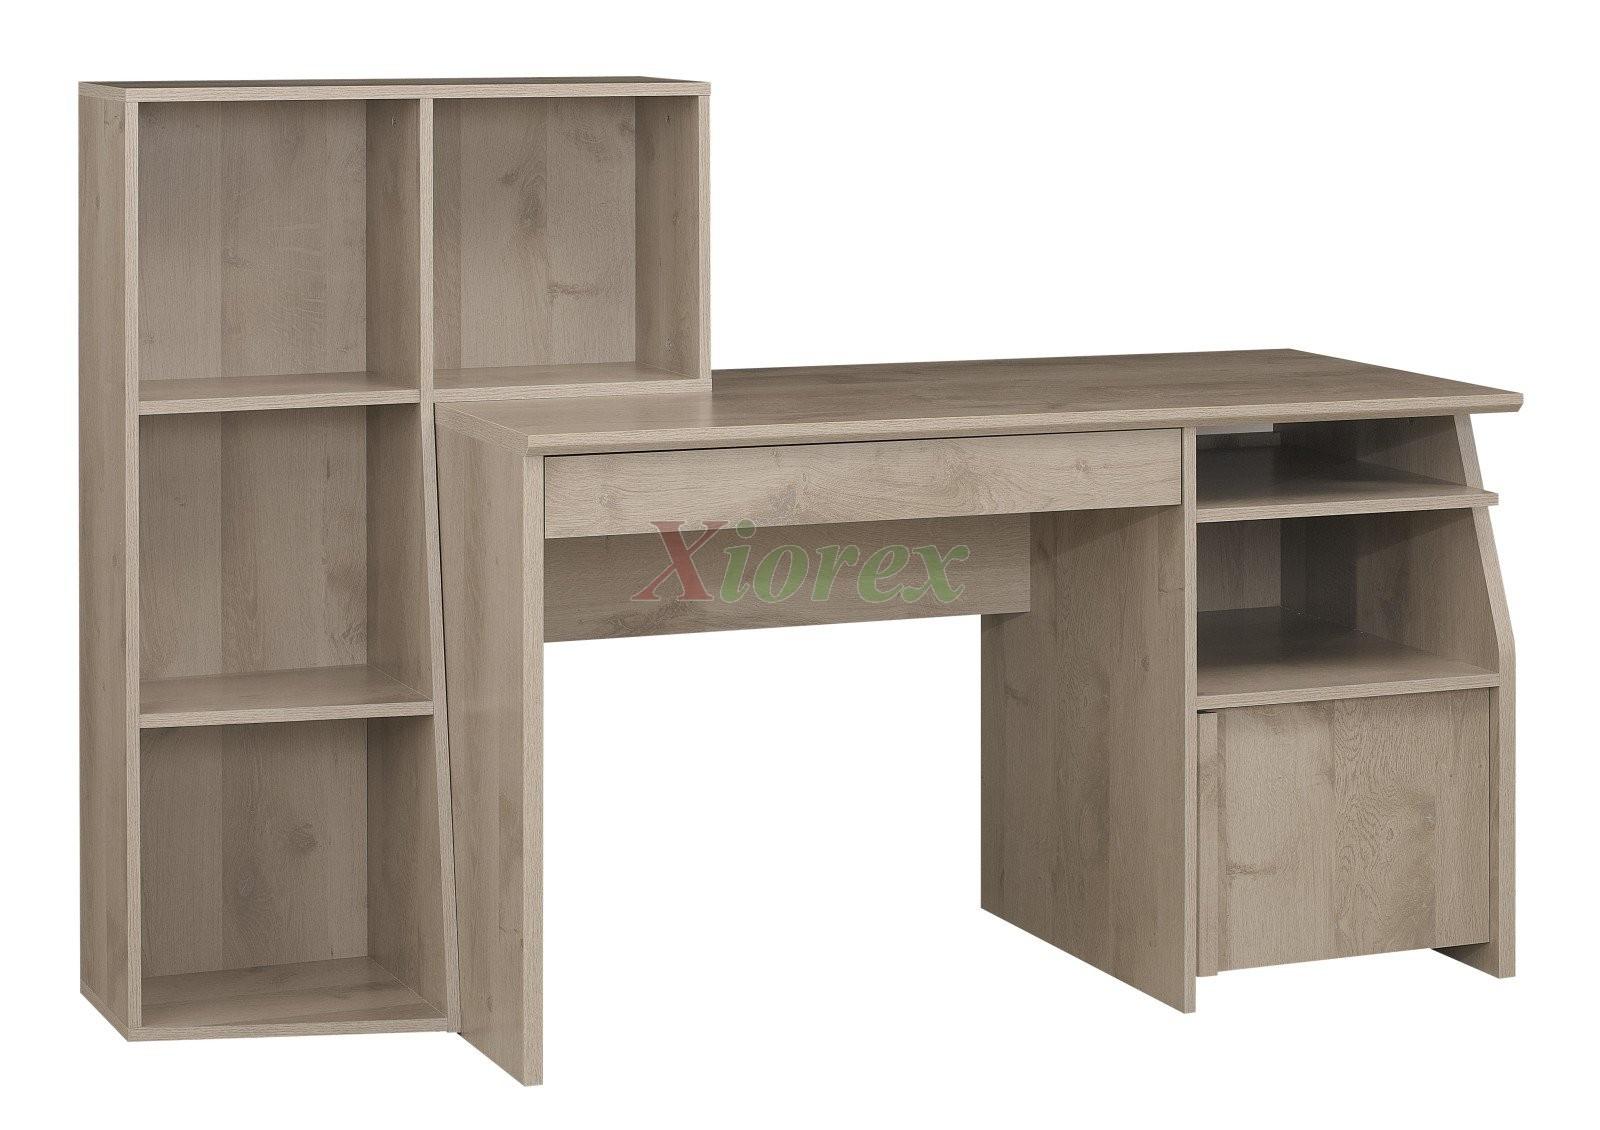 Timber Bookcase: Home Student Desk Gami Timber Student Desk For Children